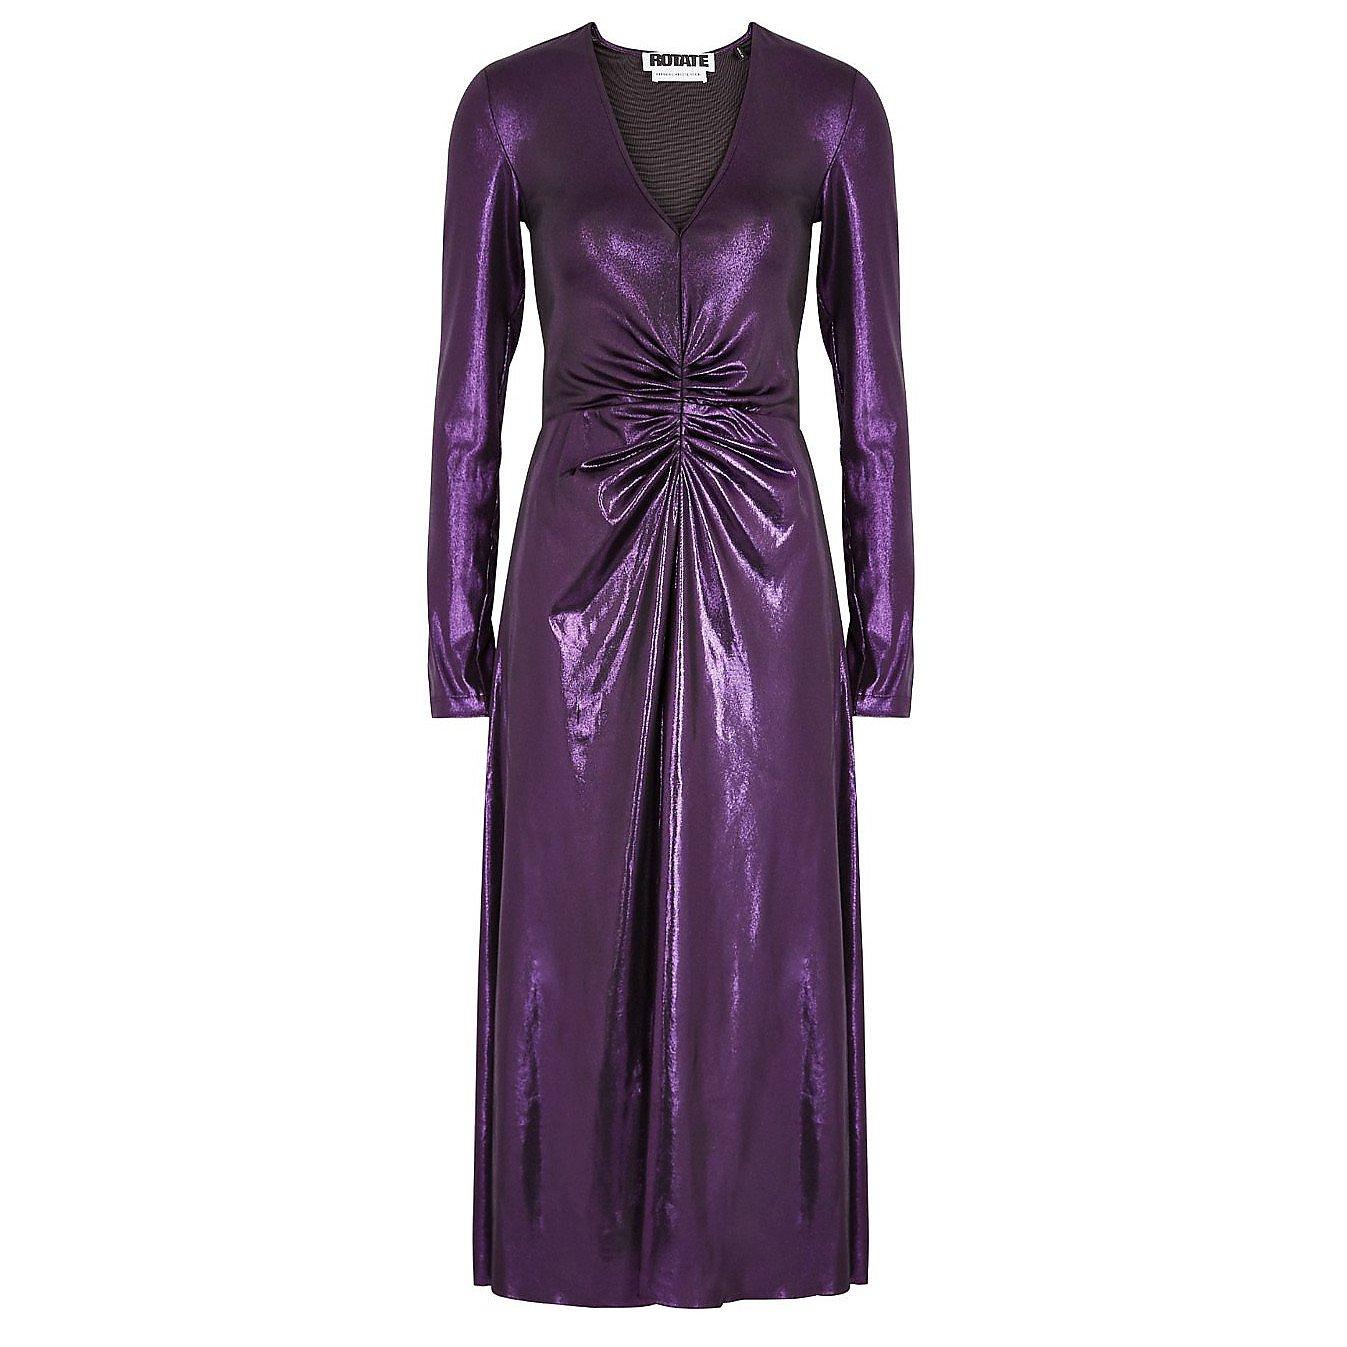 ROTATE Birger Christensen Metallic Ruched Midi Dress